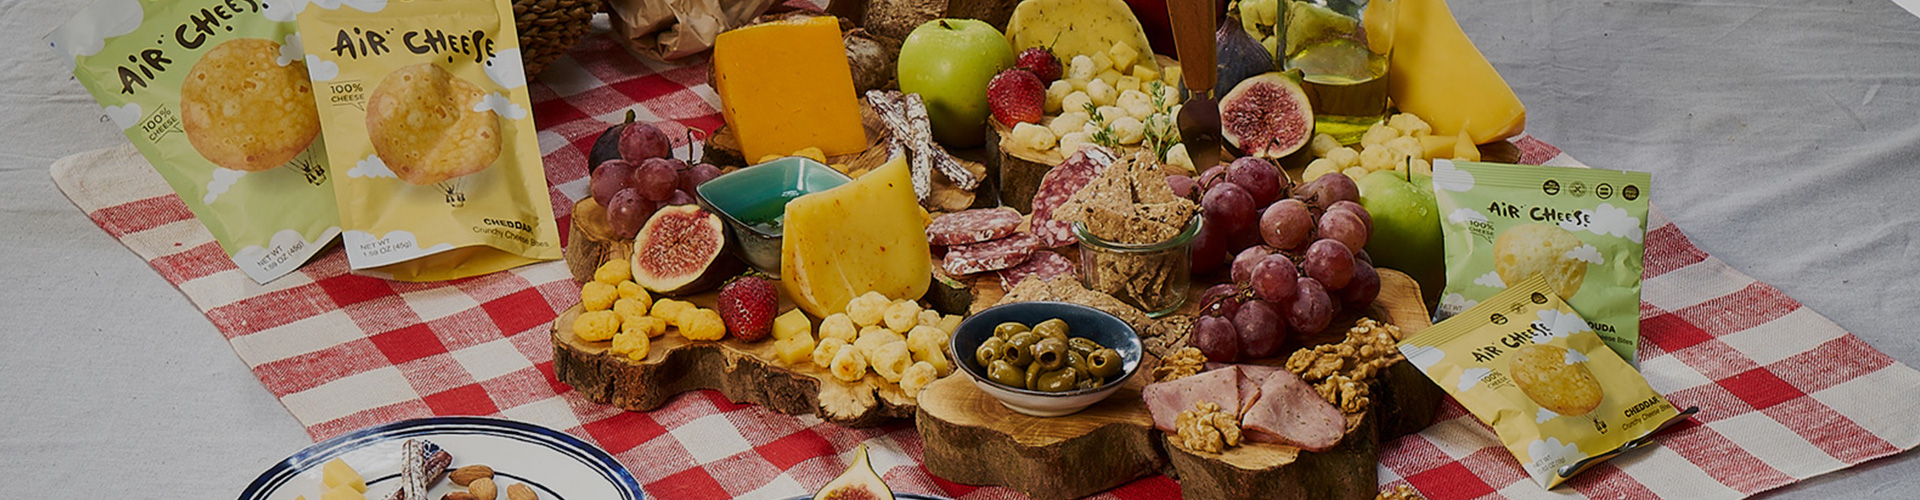 Elma Farms - High Protein Snacks